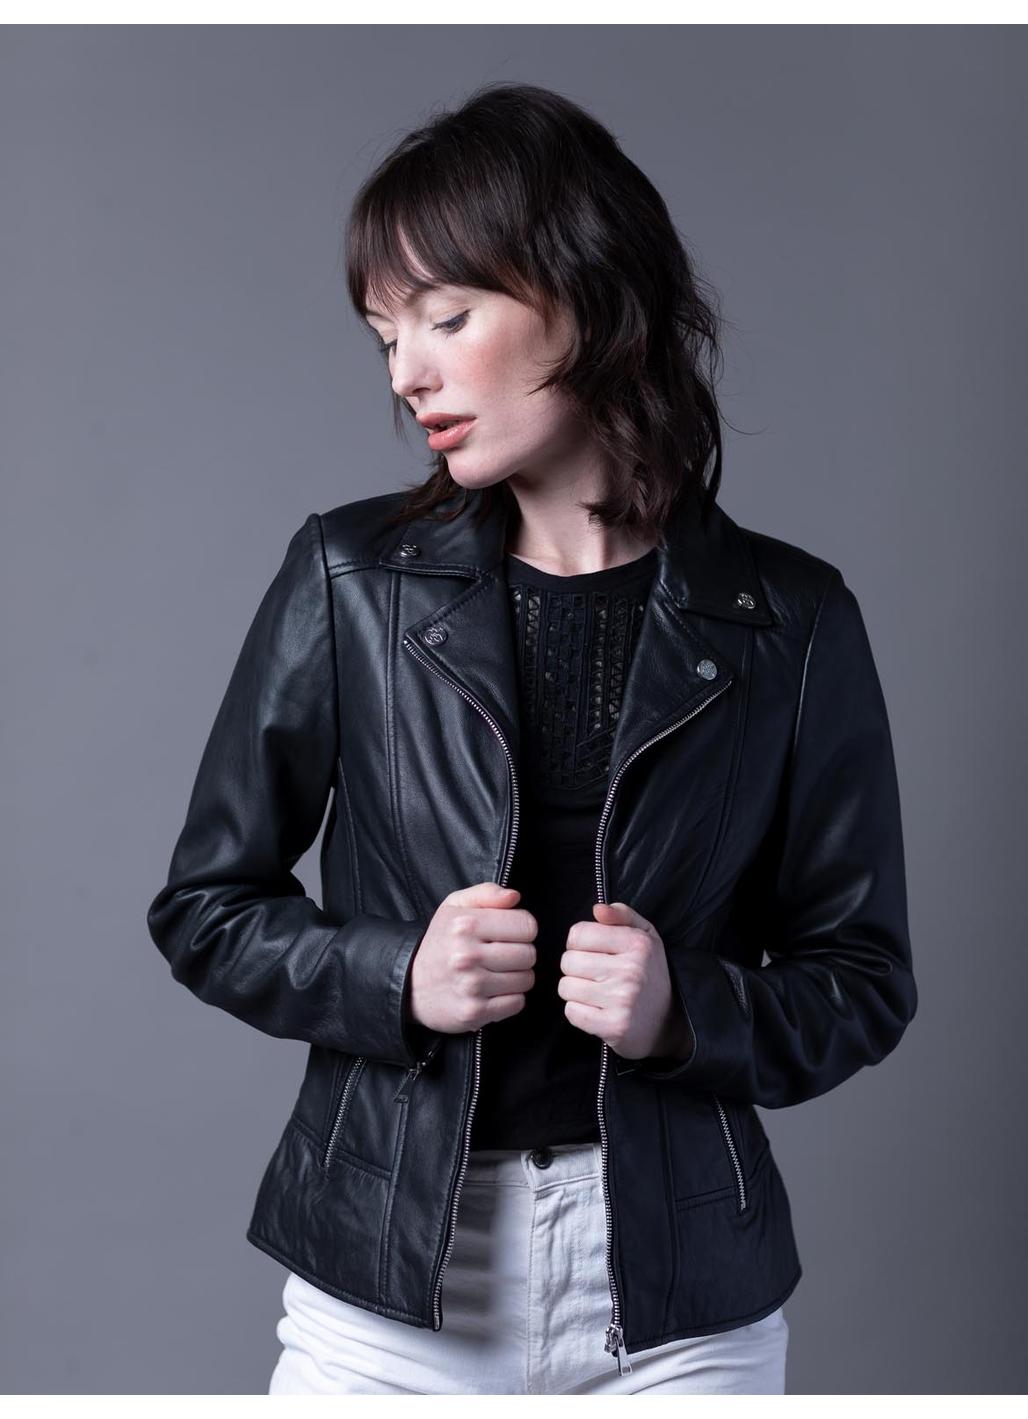 Newby Centre Zip Leather Biker Jacket in Black